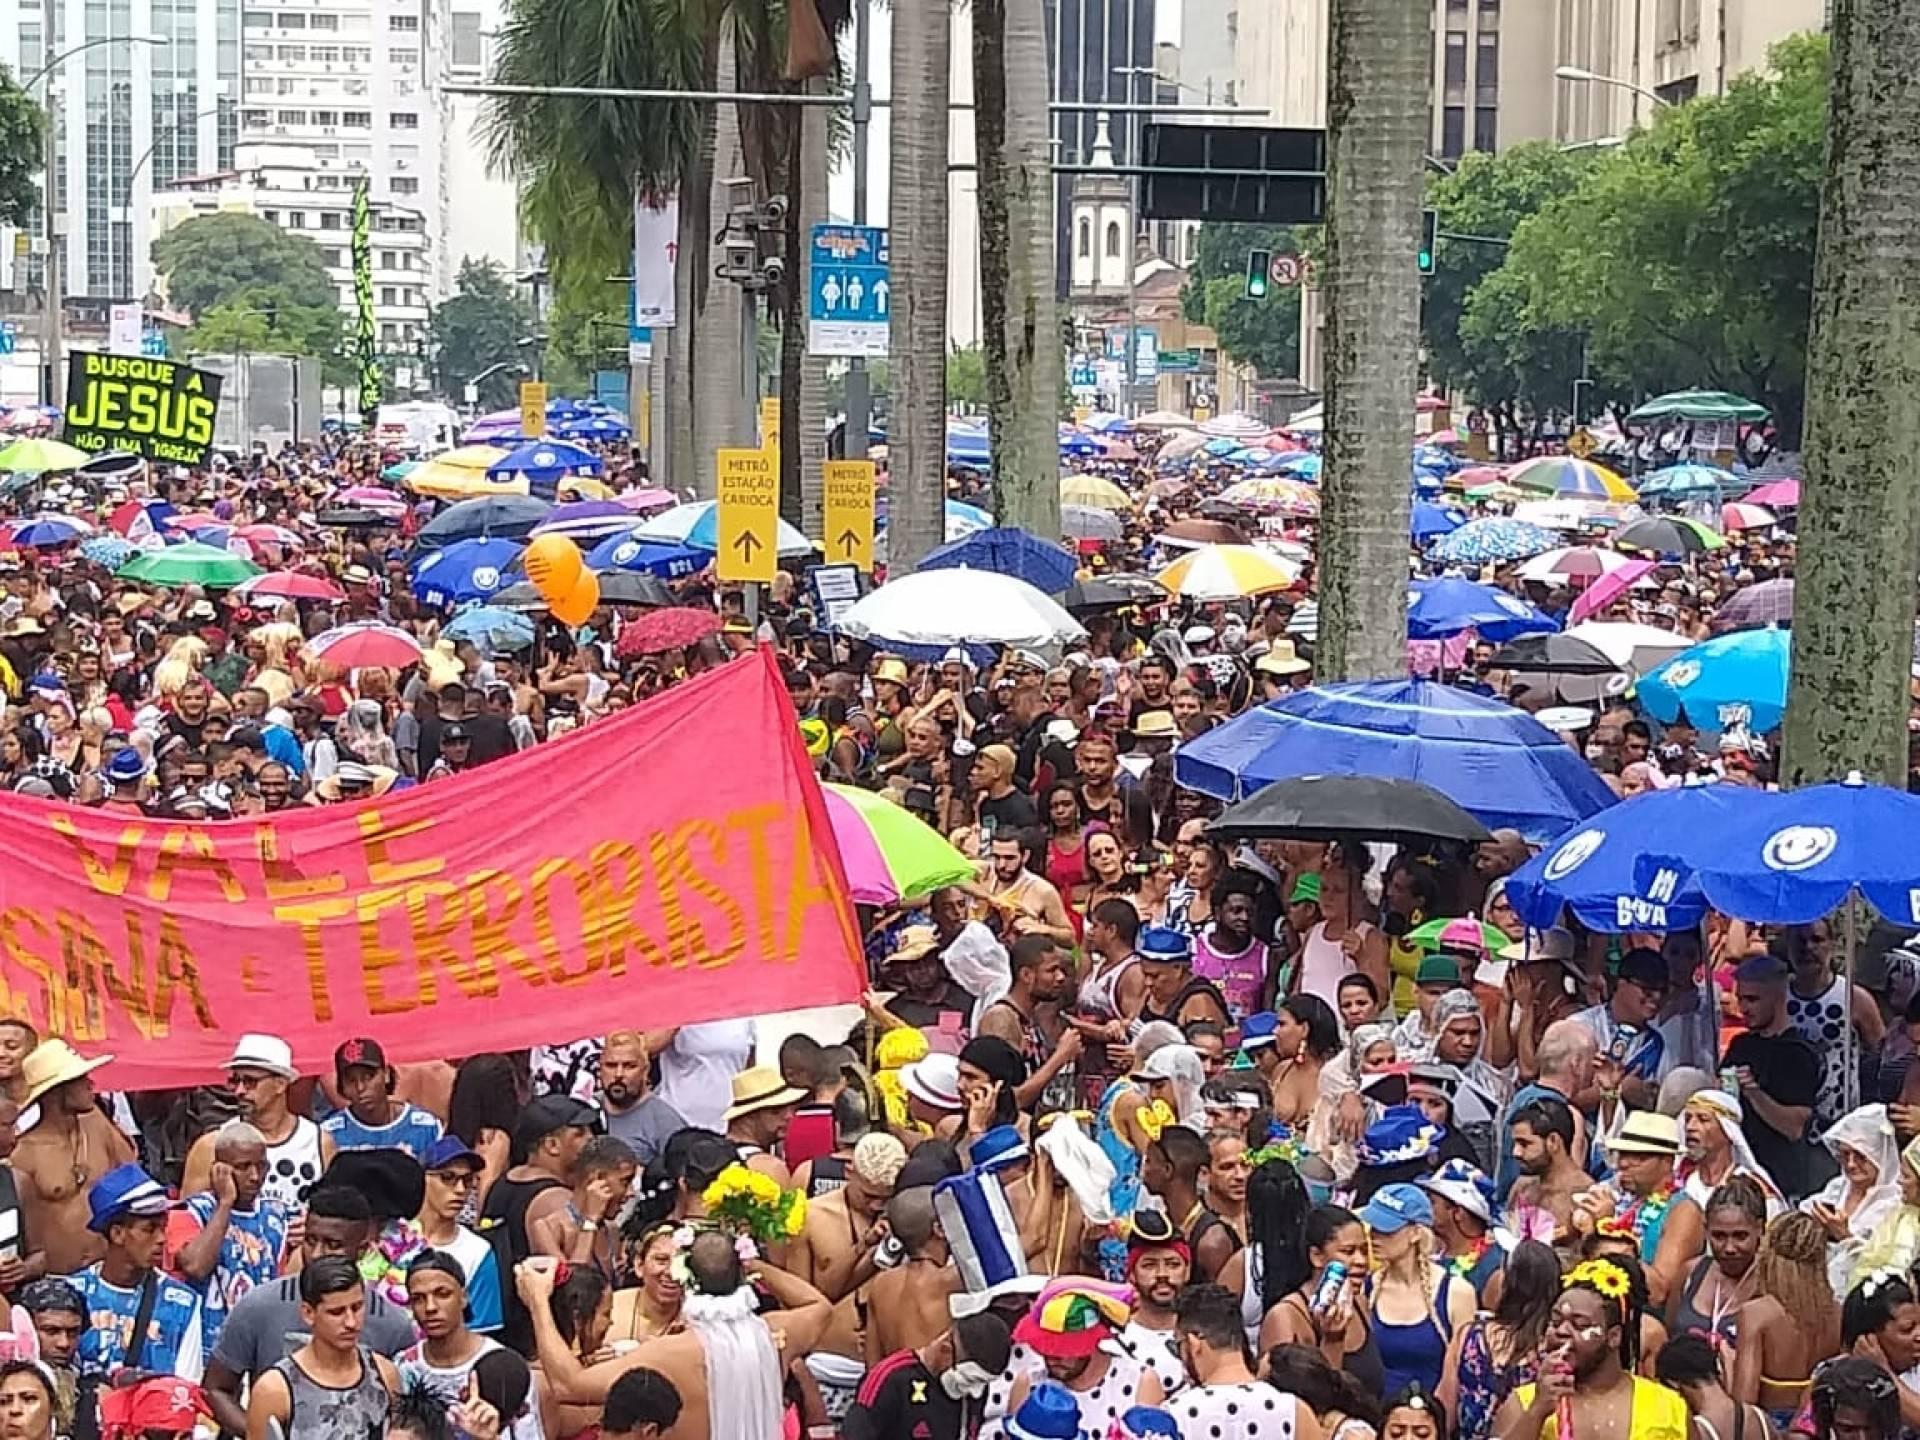 d5fbcf5139cb9 Cordão da Bola Preta agita o Centro do Rio debaixo de chuva MH ...